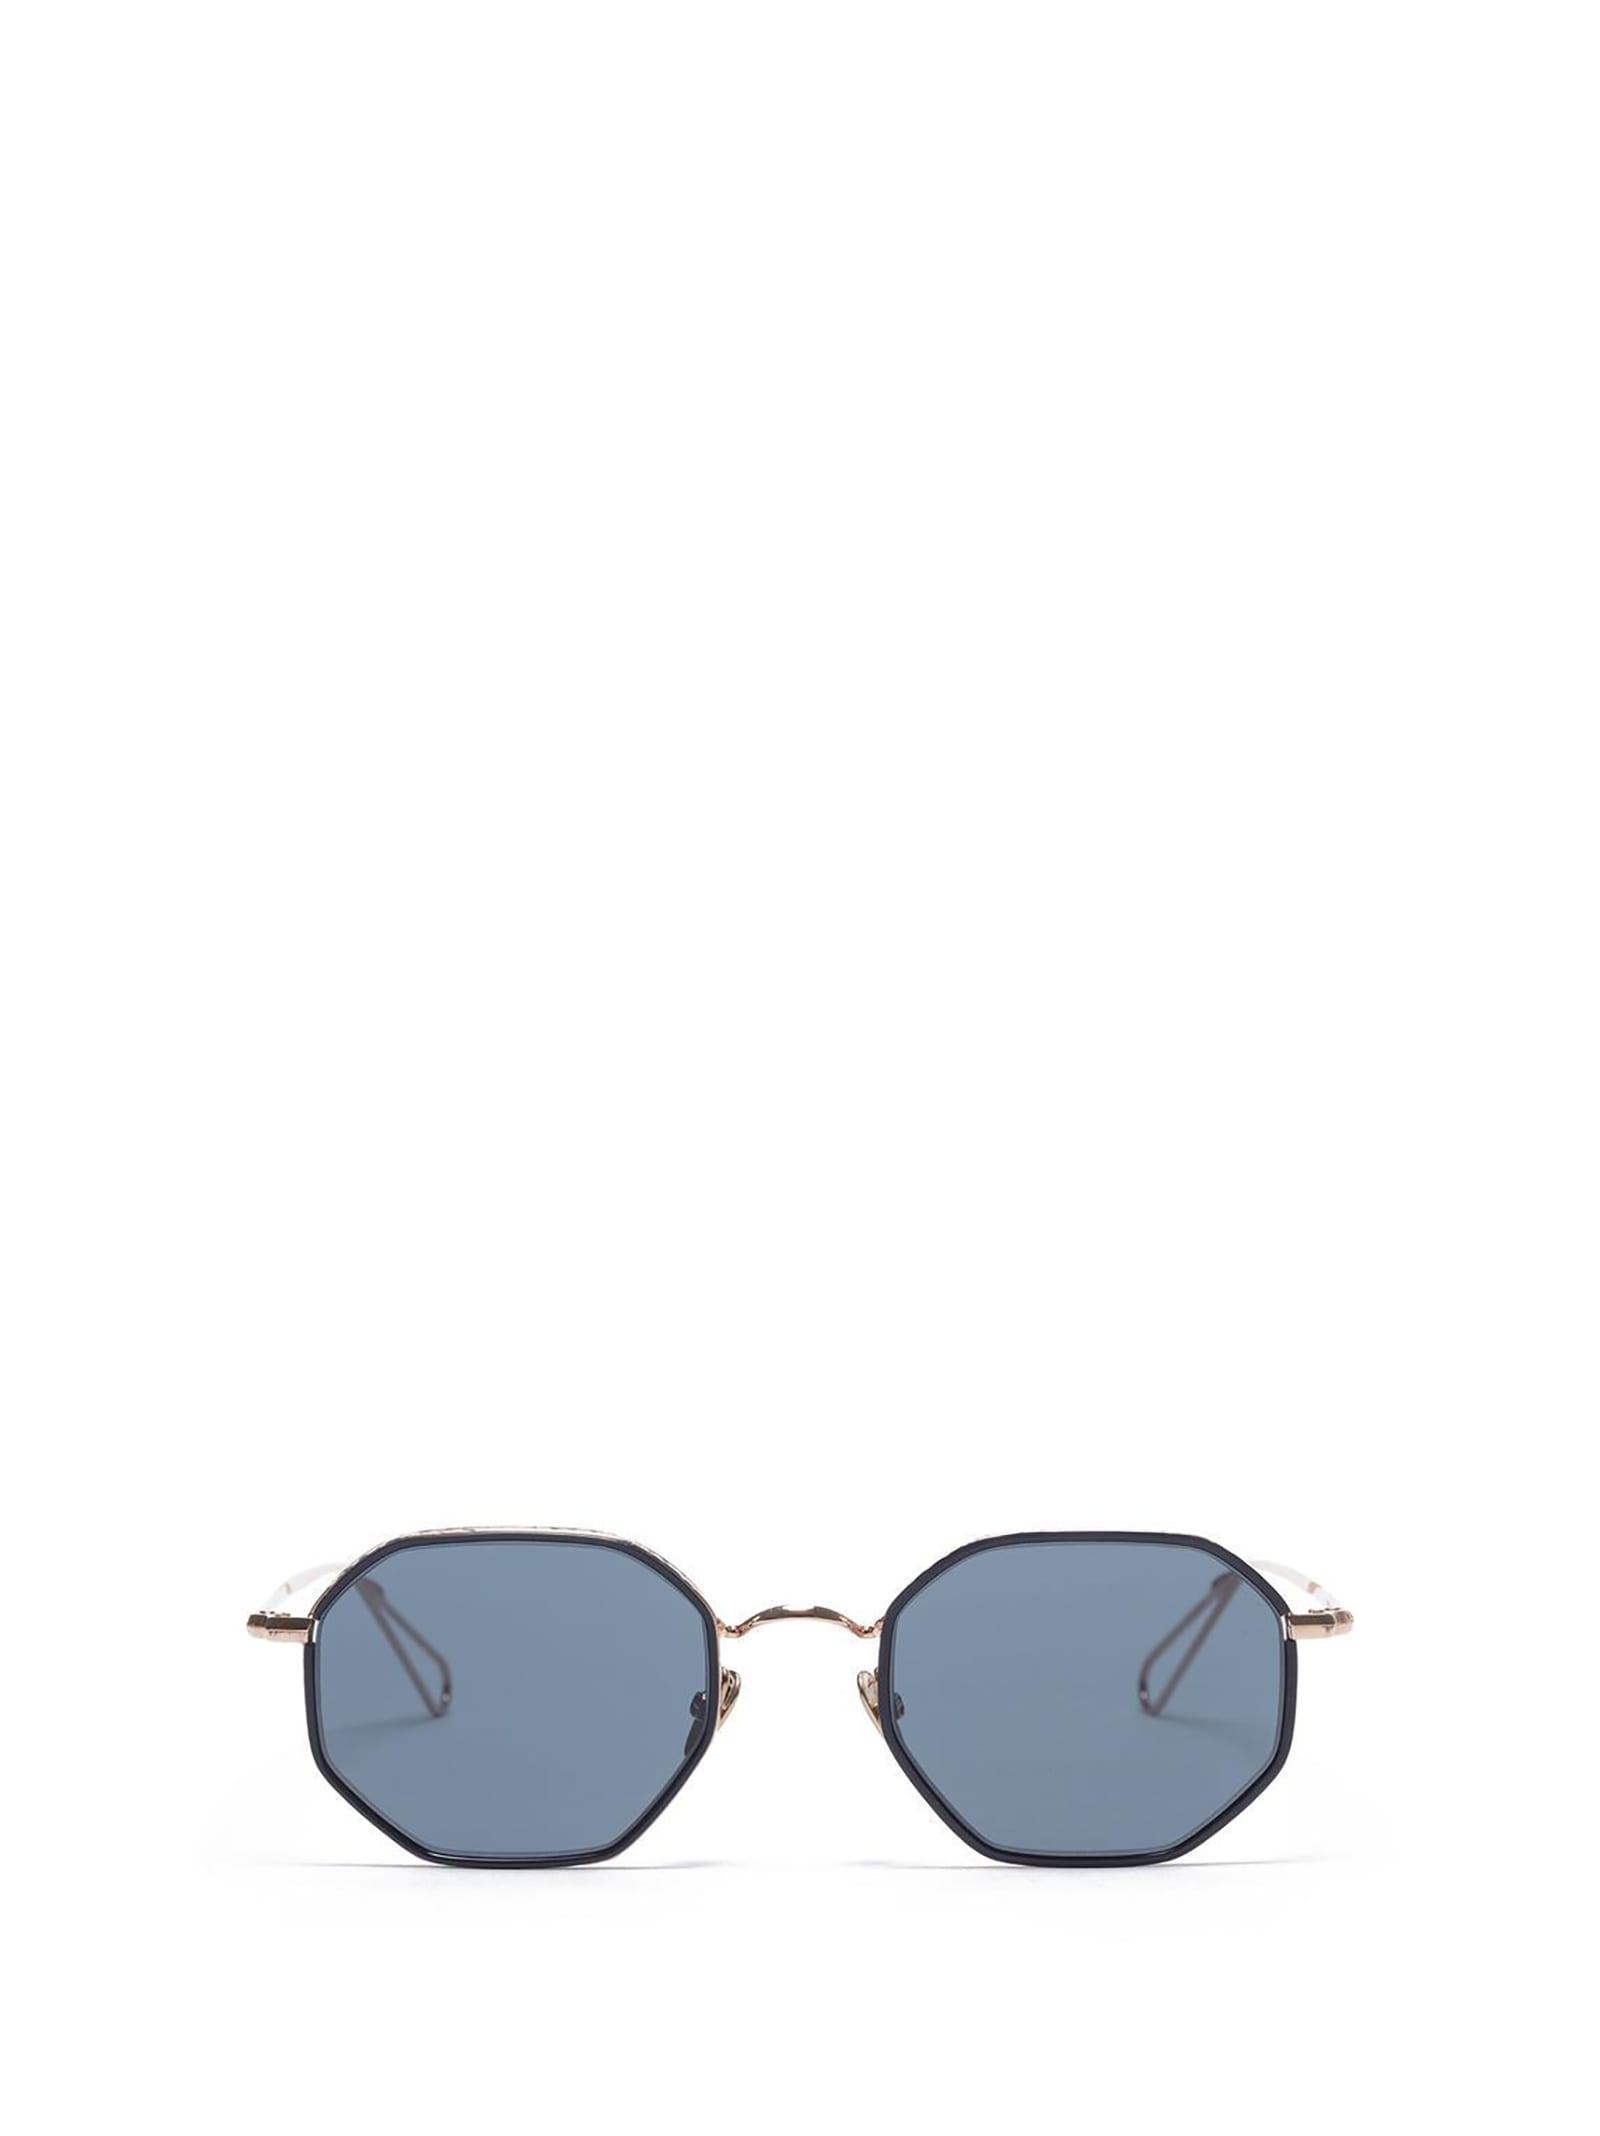 AHLEM Ahlem Luxembourg Peony Gold Blue Windsor Sunglasses